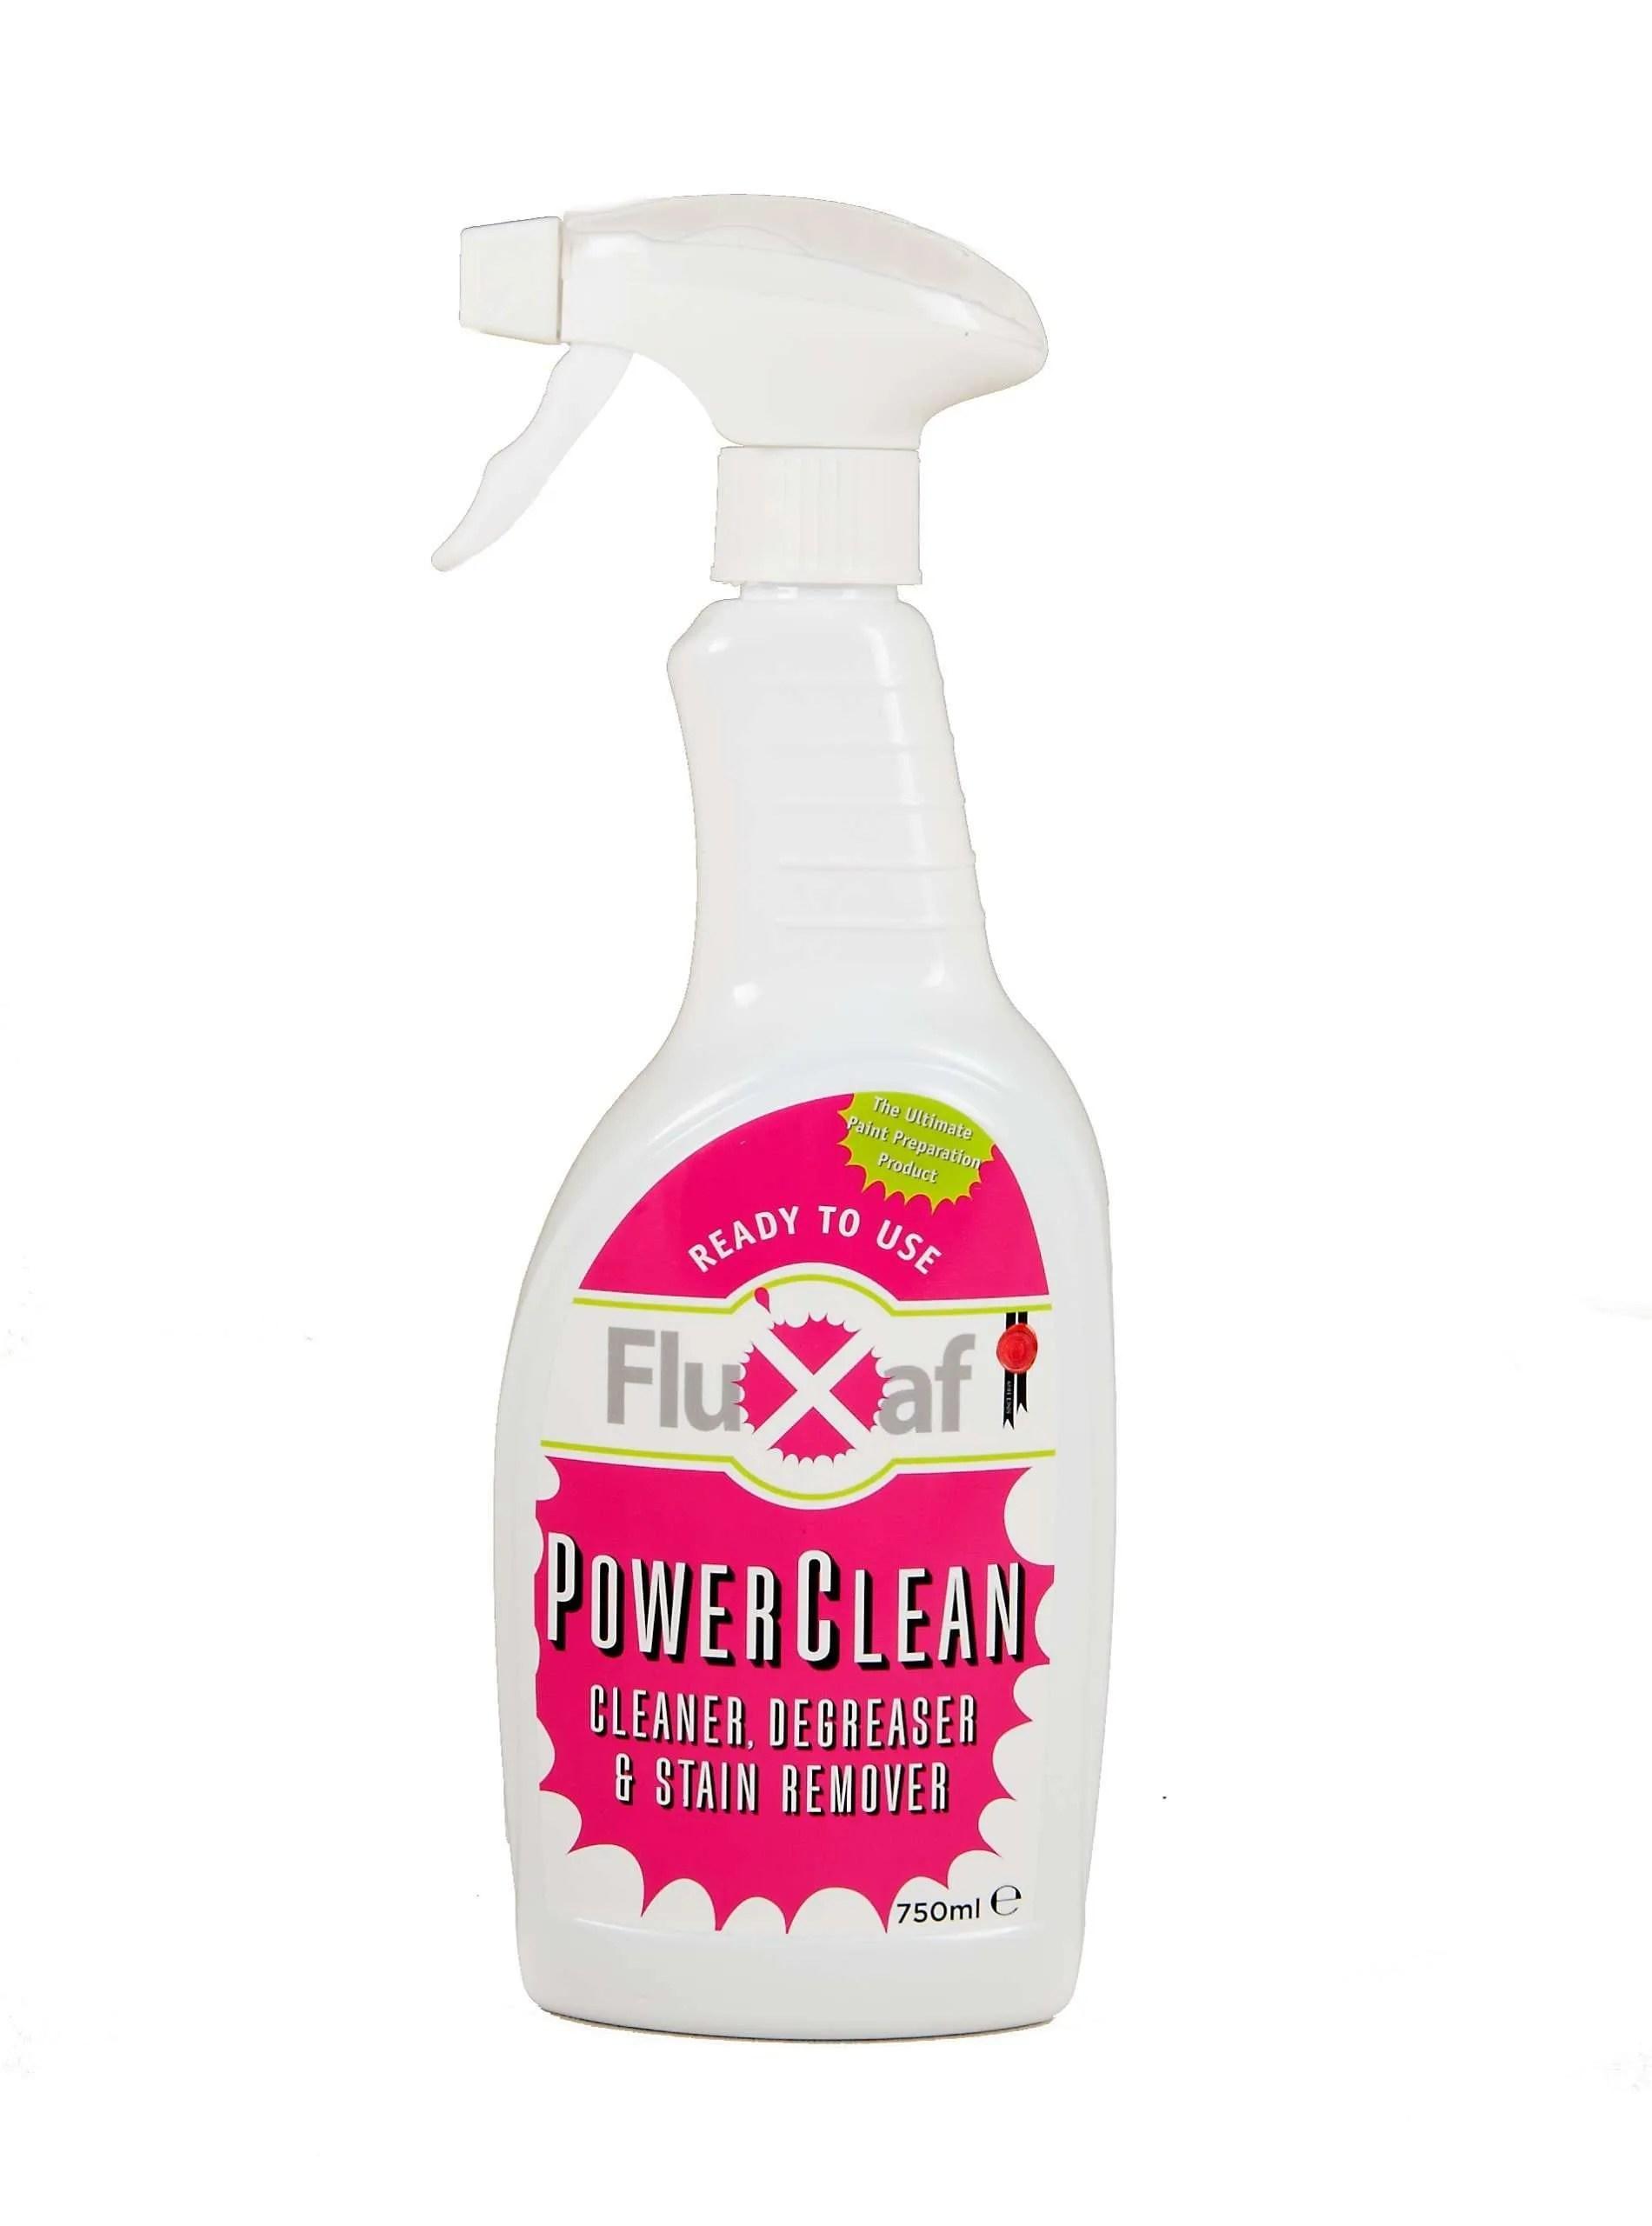 Fluxaf-Power-Clean-750ml